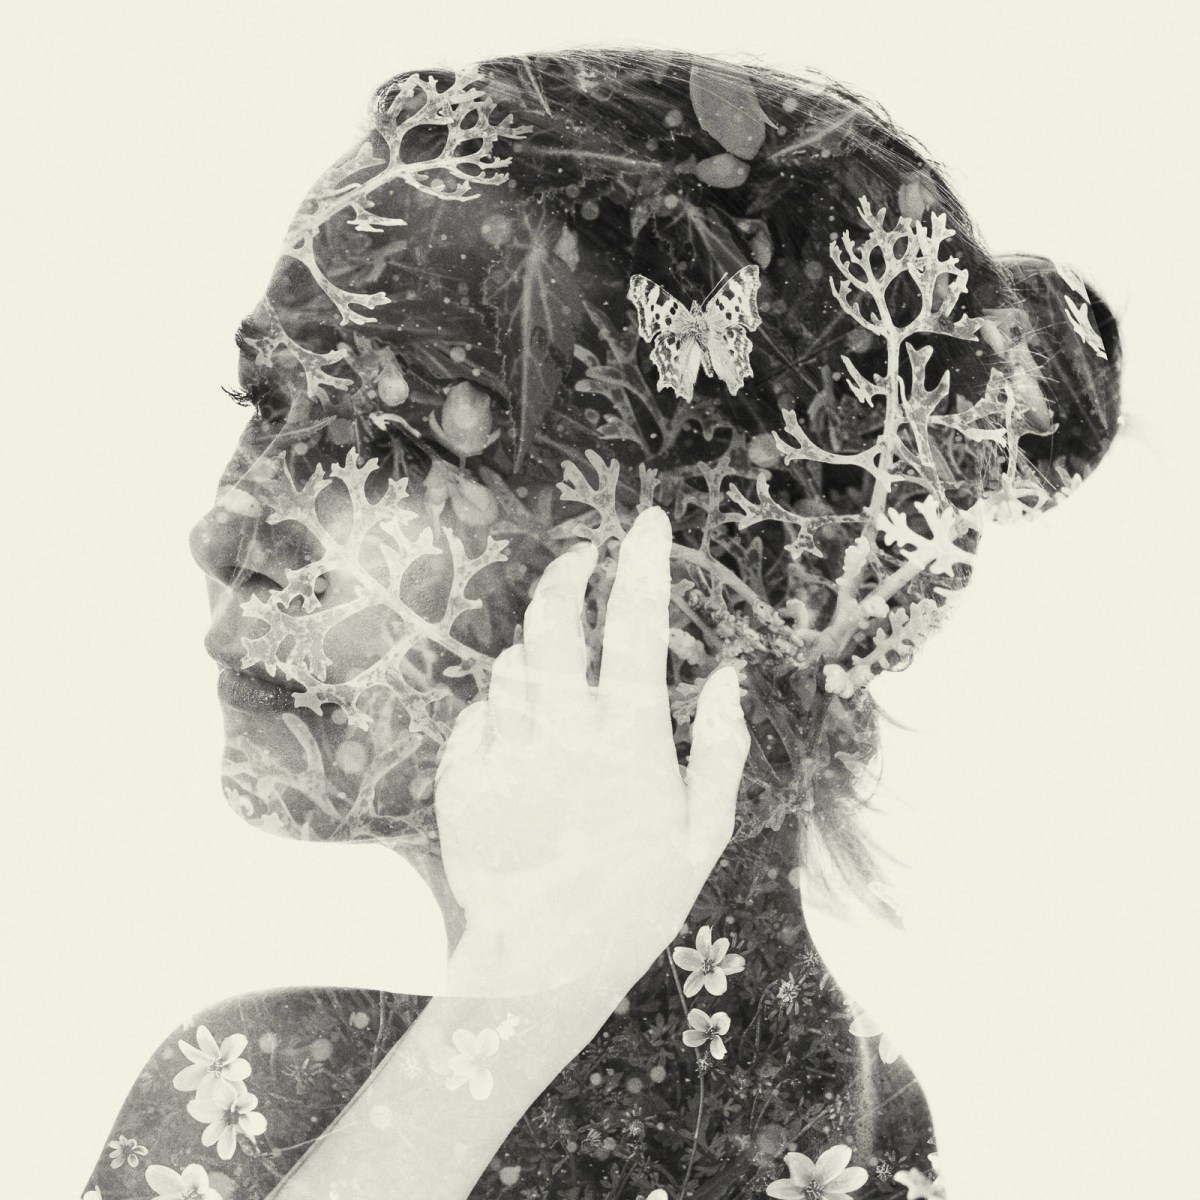 photography-christoffer-relander-07